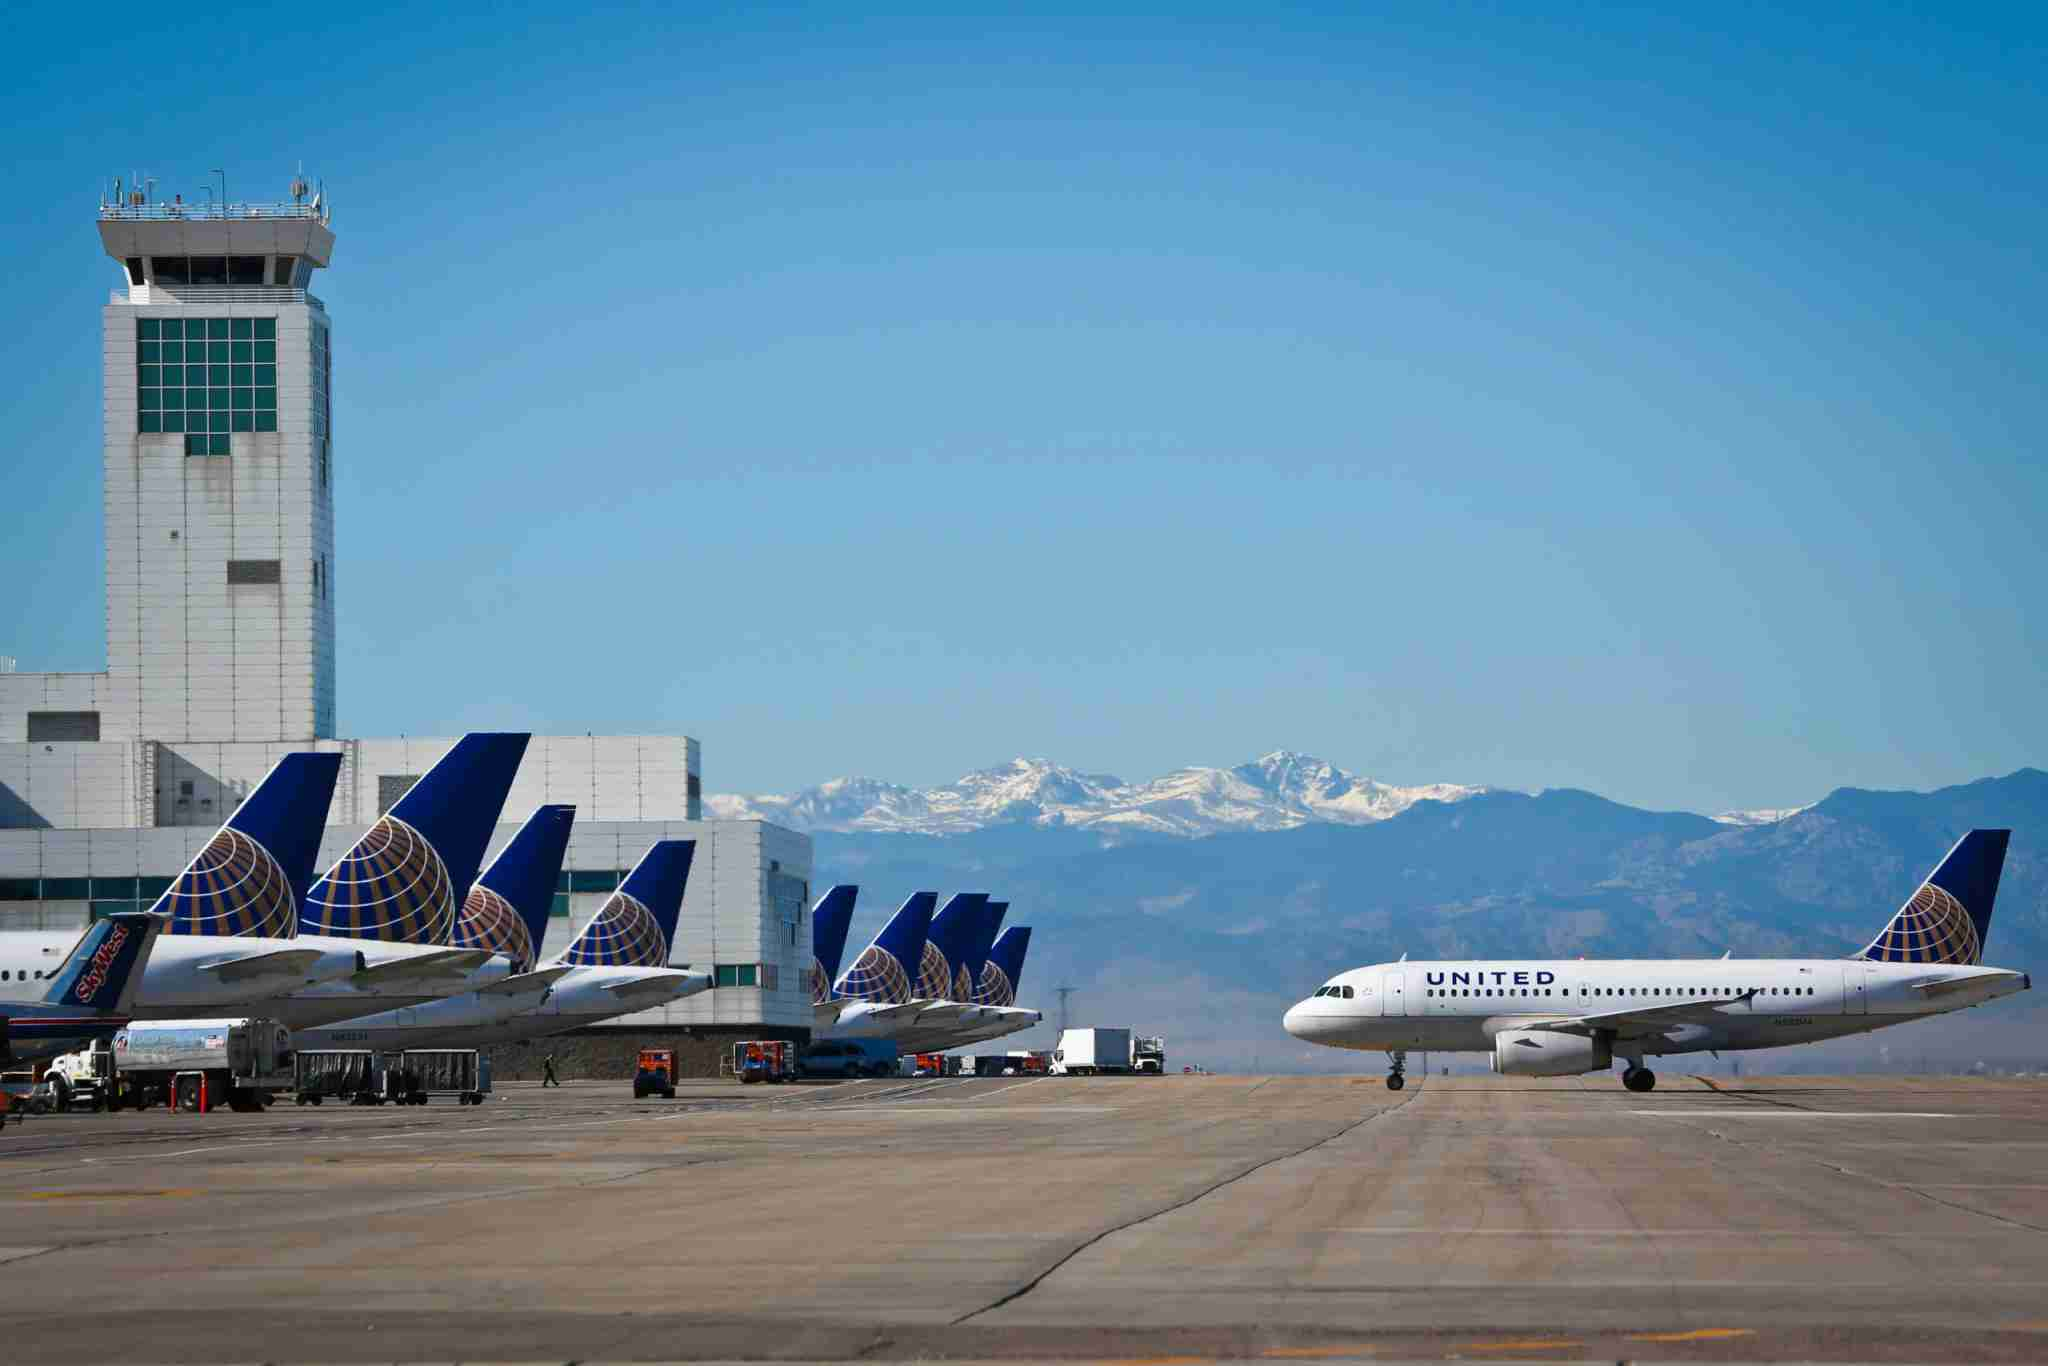 United Airlines tails at Denver International Airport. (Photo courtesy of Denver International Airport)